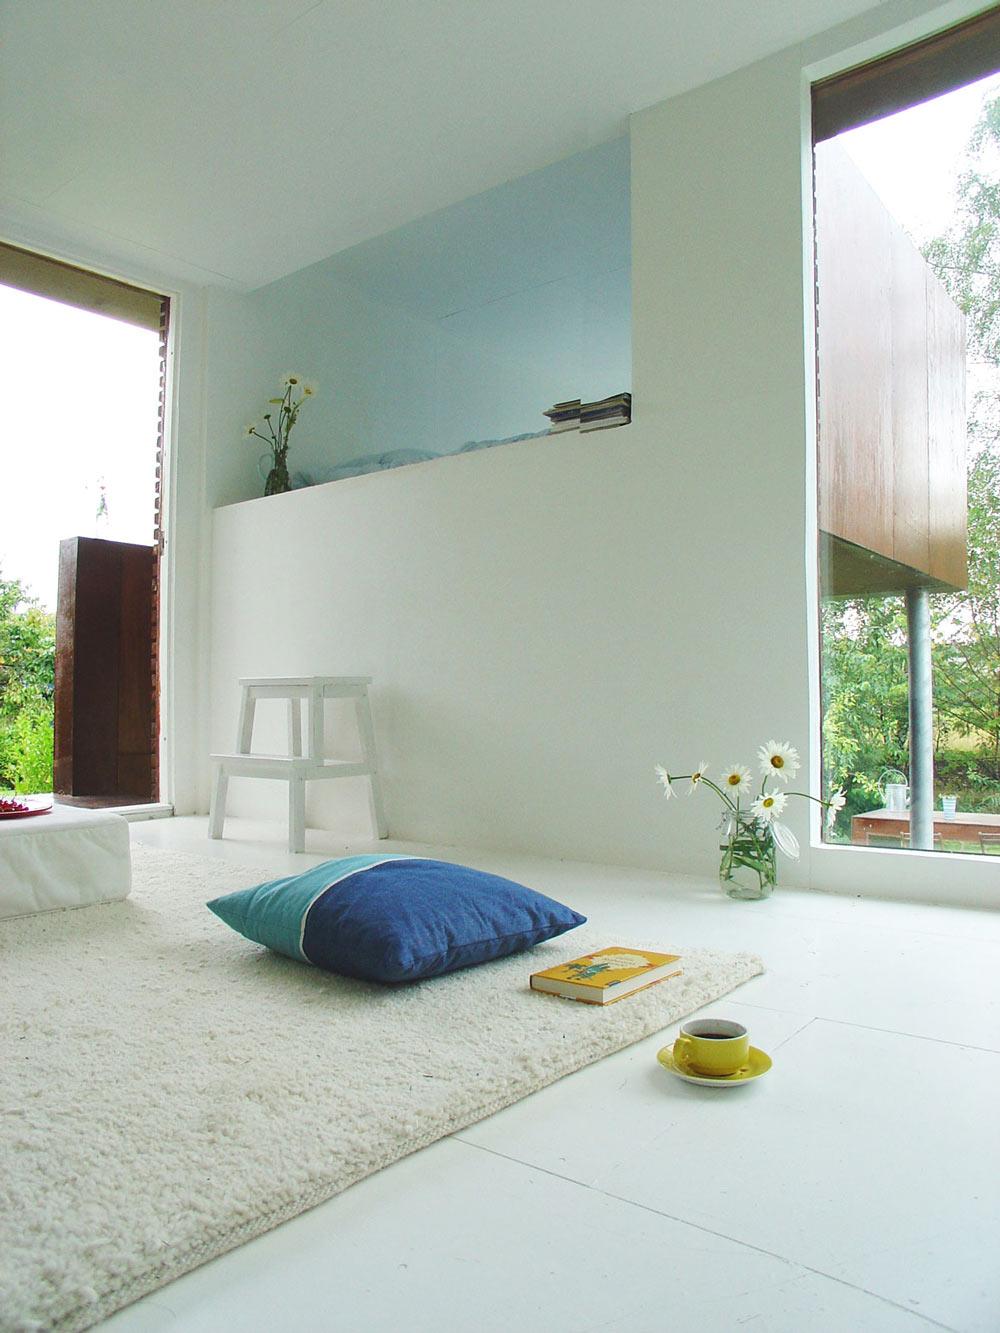 Rug, Living Space, Casa Kolonihagen in Stavanger, Norway by Tommie Wilhelmsen